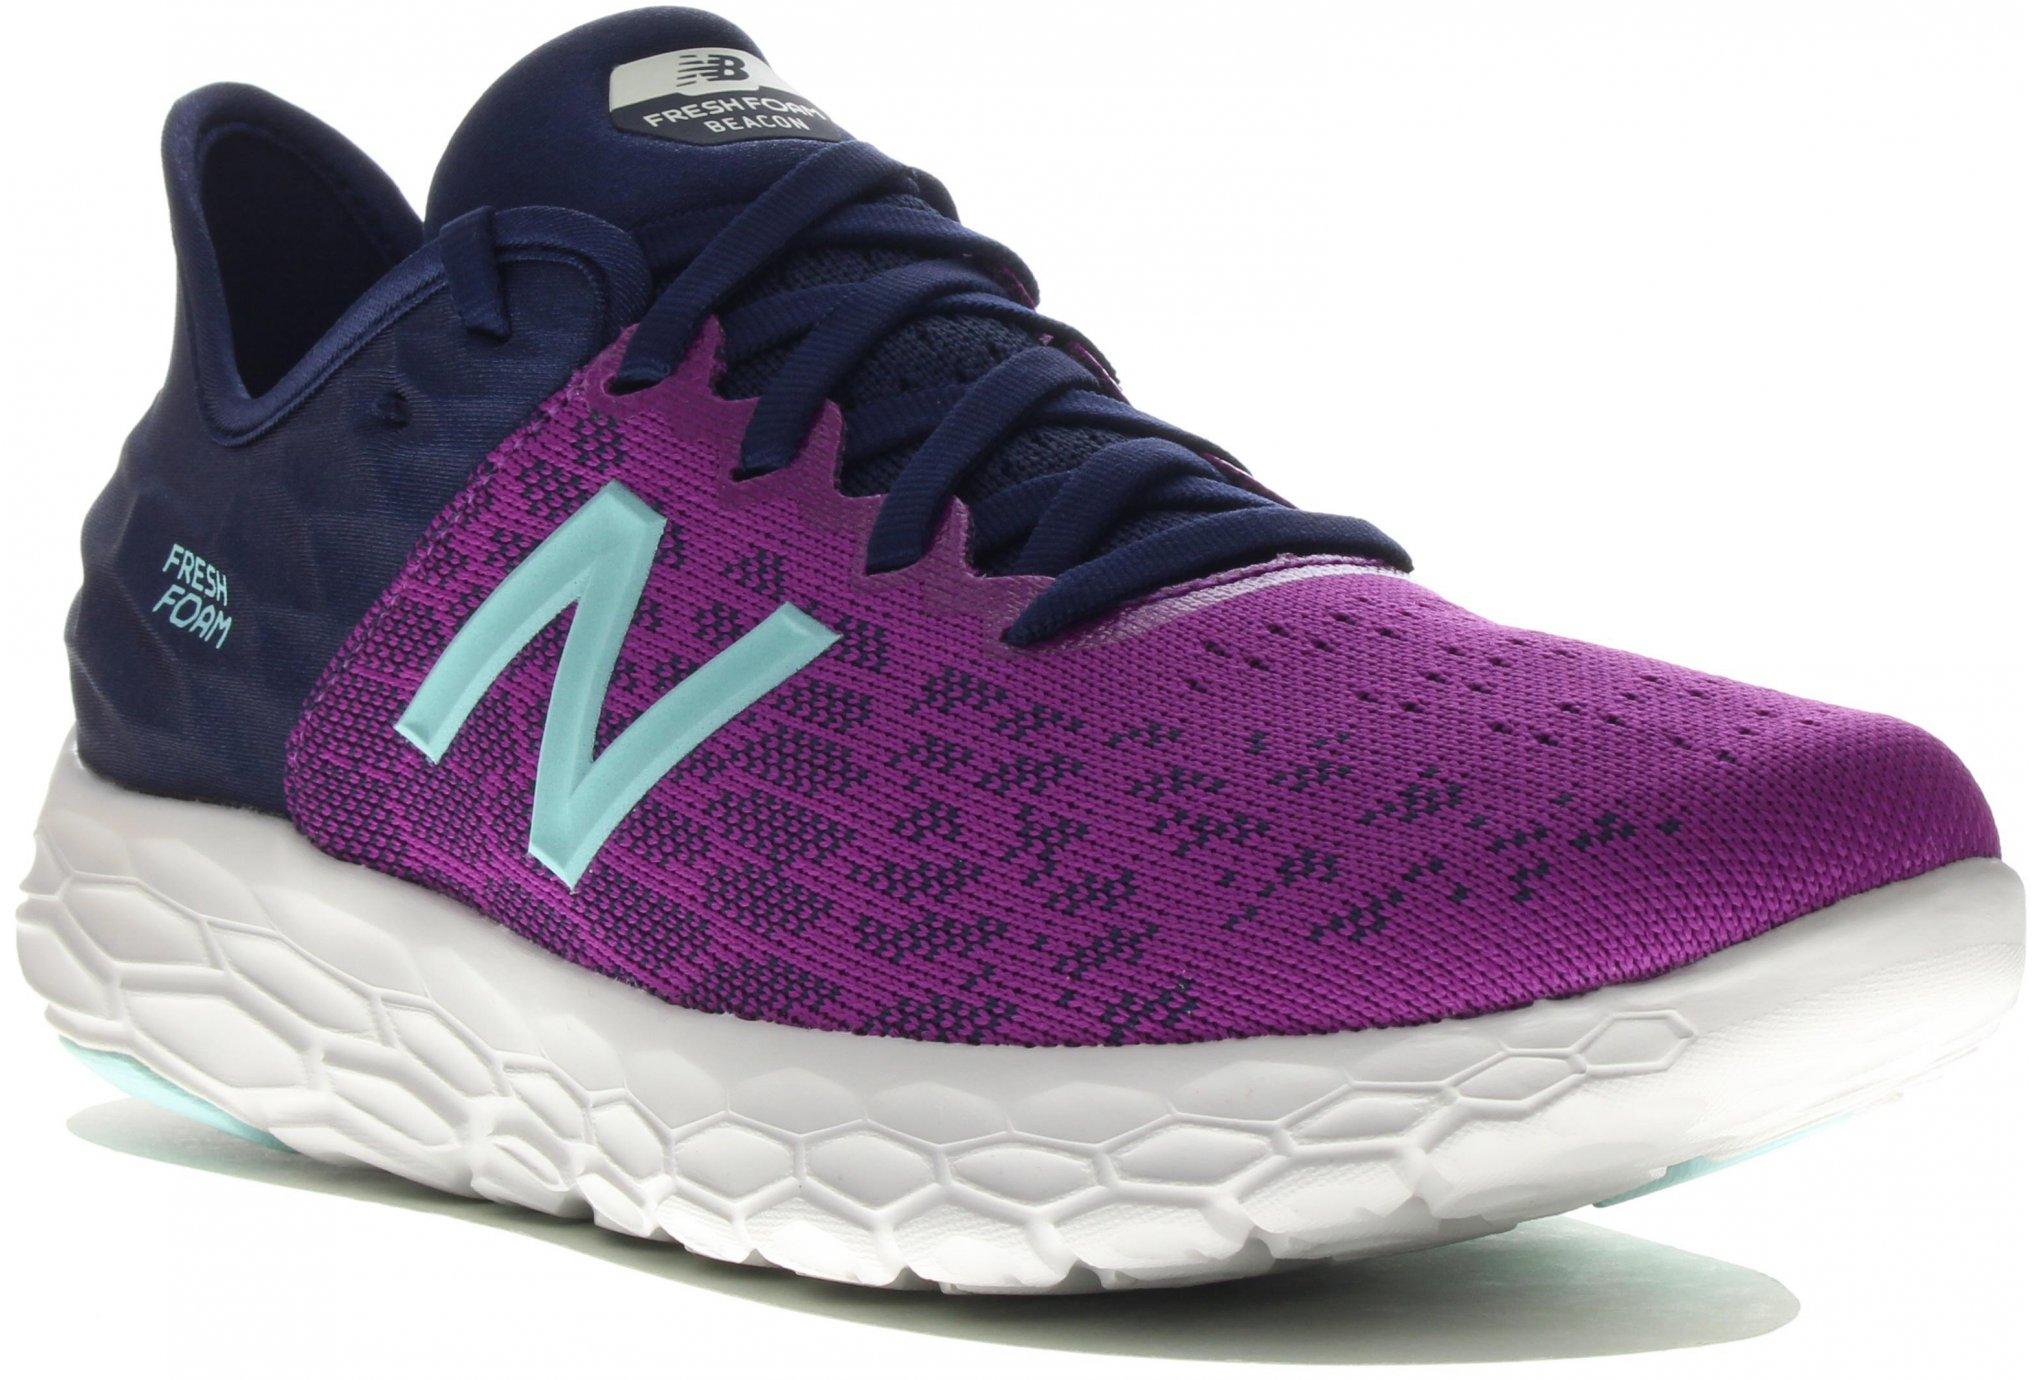 New Balance Fresh Foam Beacon V2 Chaussures running femme